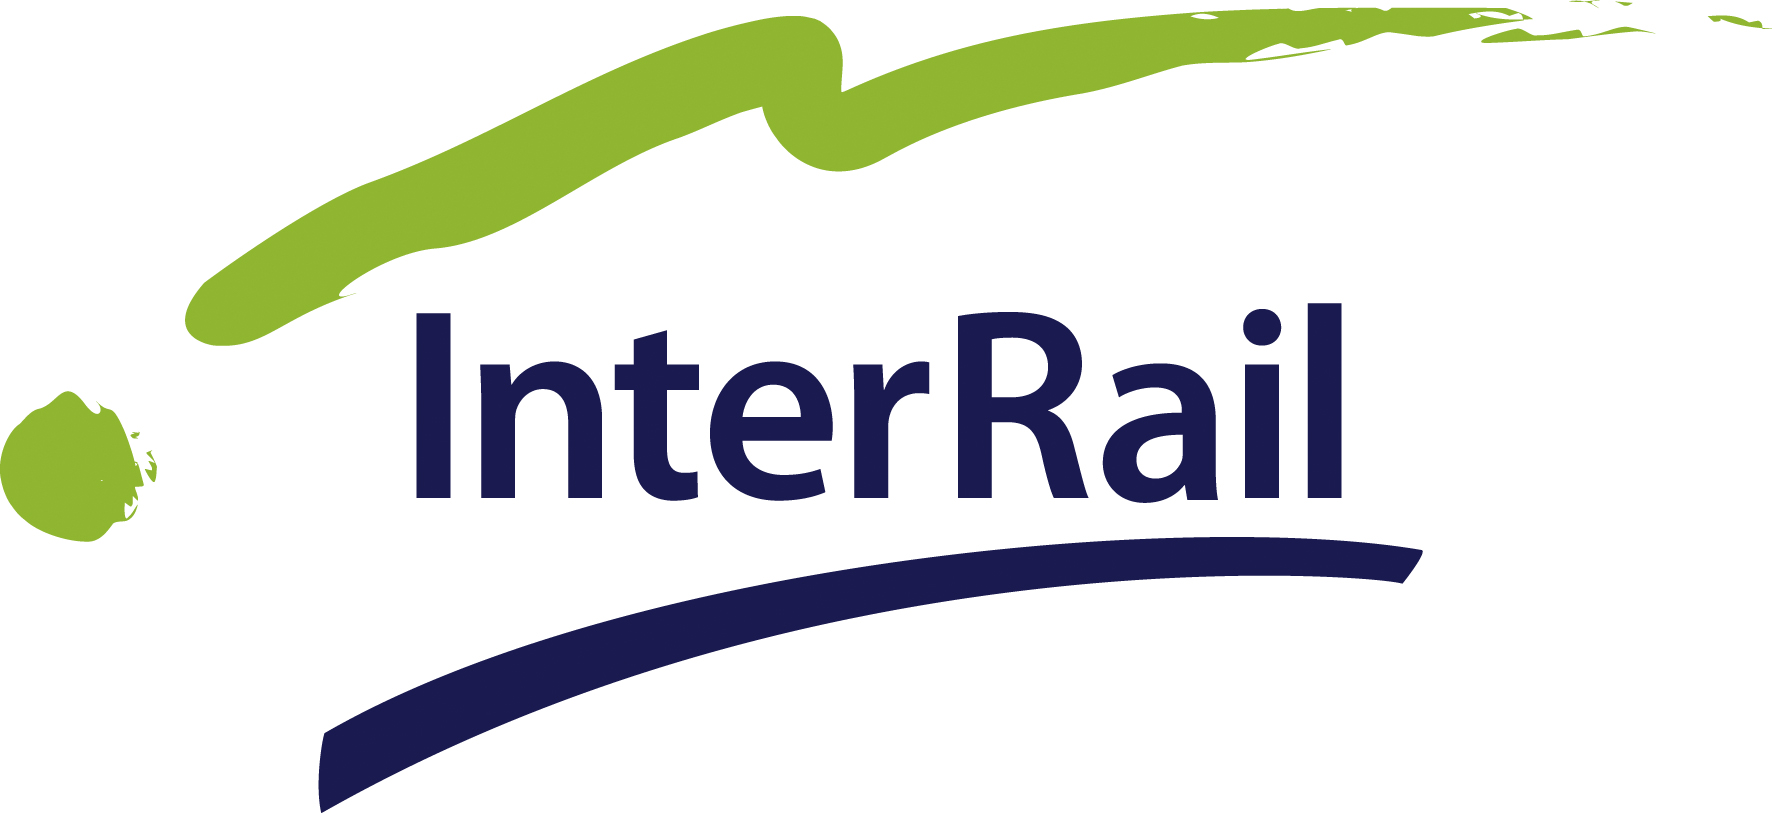 interrail logo InterRail Pass, la revolución del transporte económico por Europa